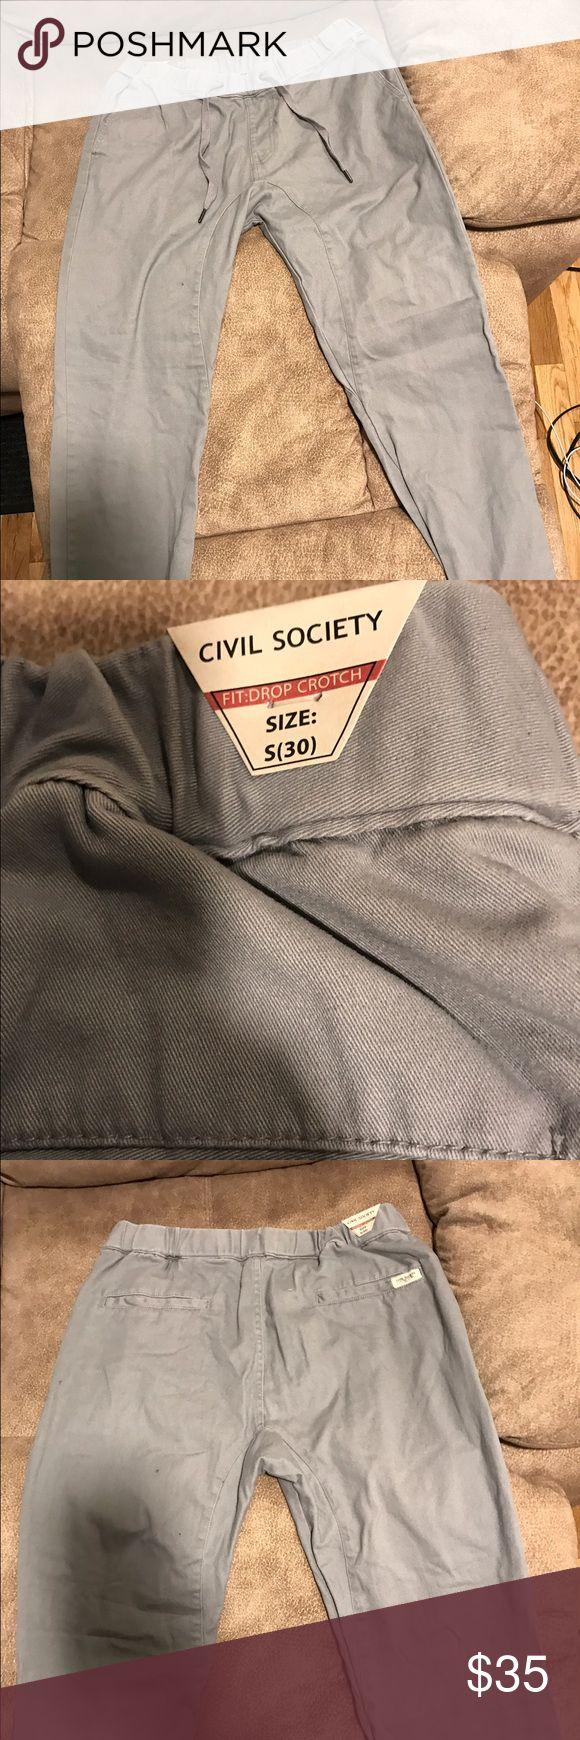 Men's pants civil society size 30 Grey civil society men's pants. Size 30 brand new never worn. Civil Society Pants